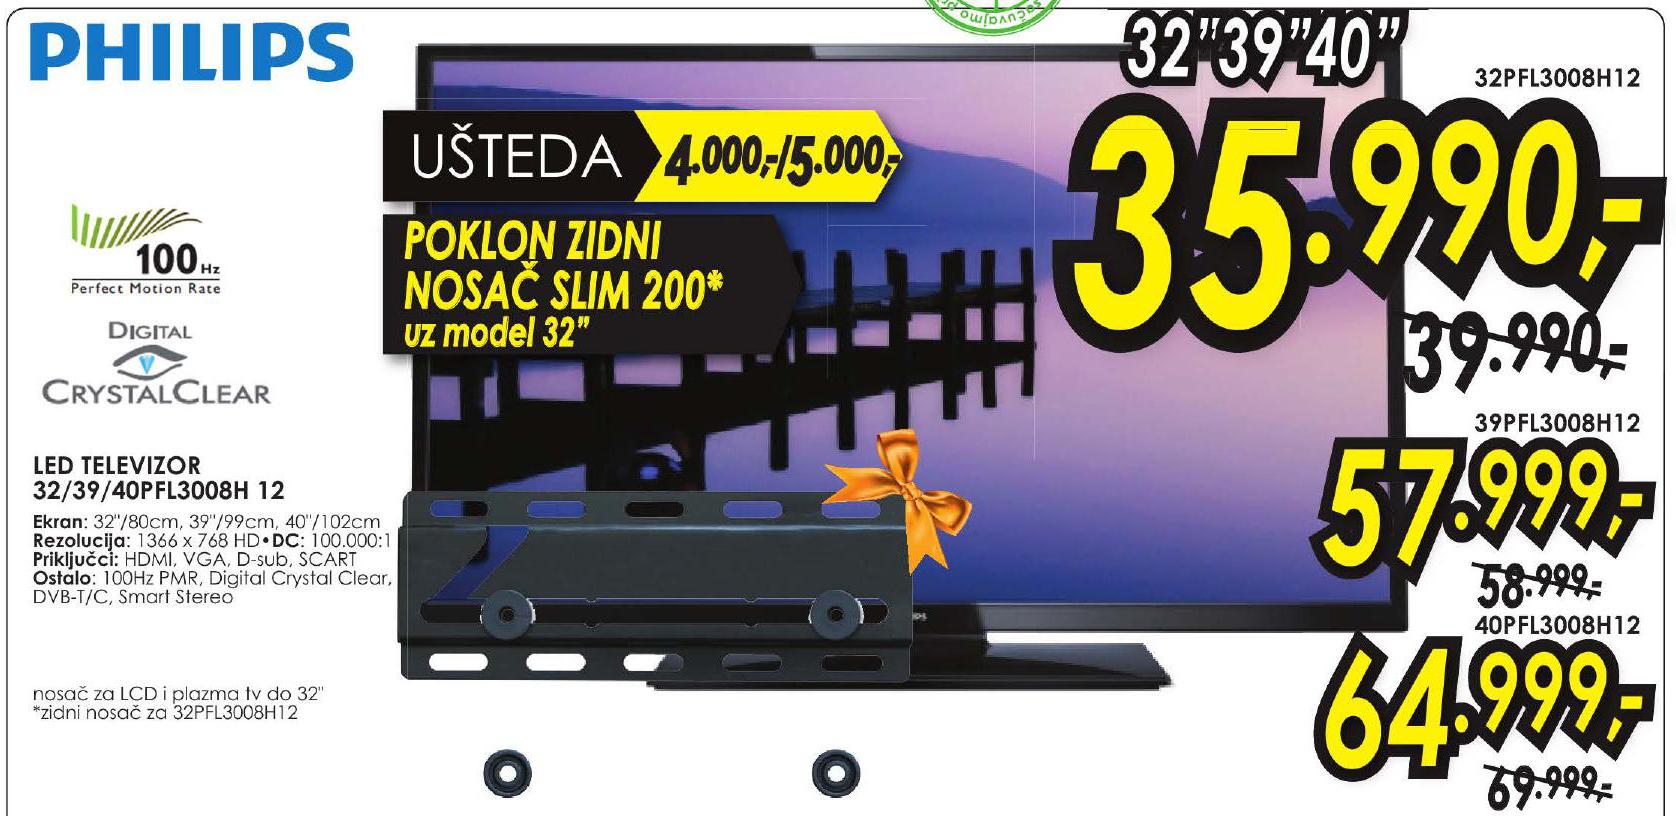 LED Televizor 32FL3008H + Poklon zodni nosač slim